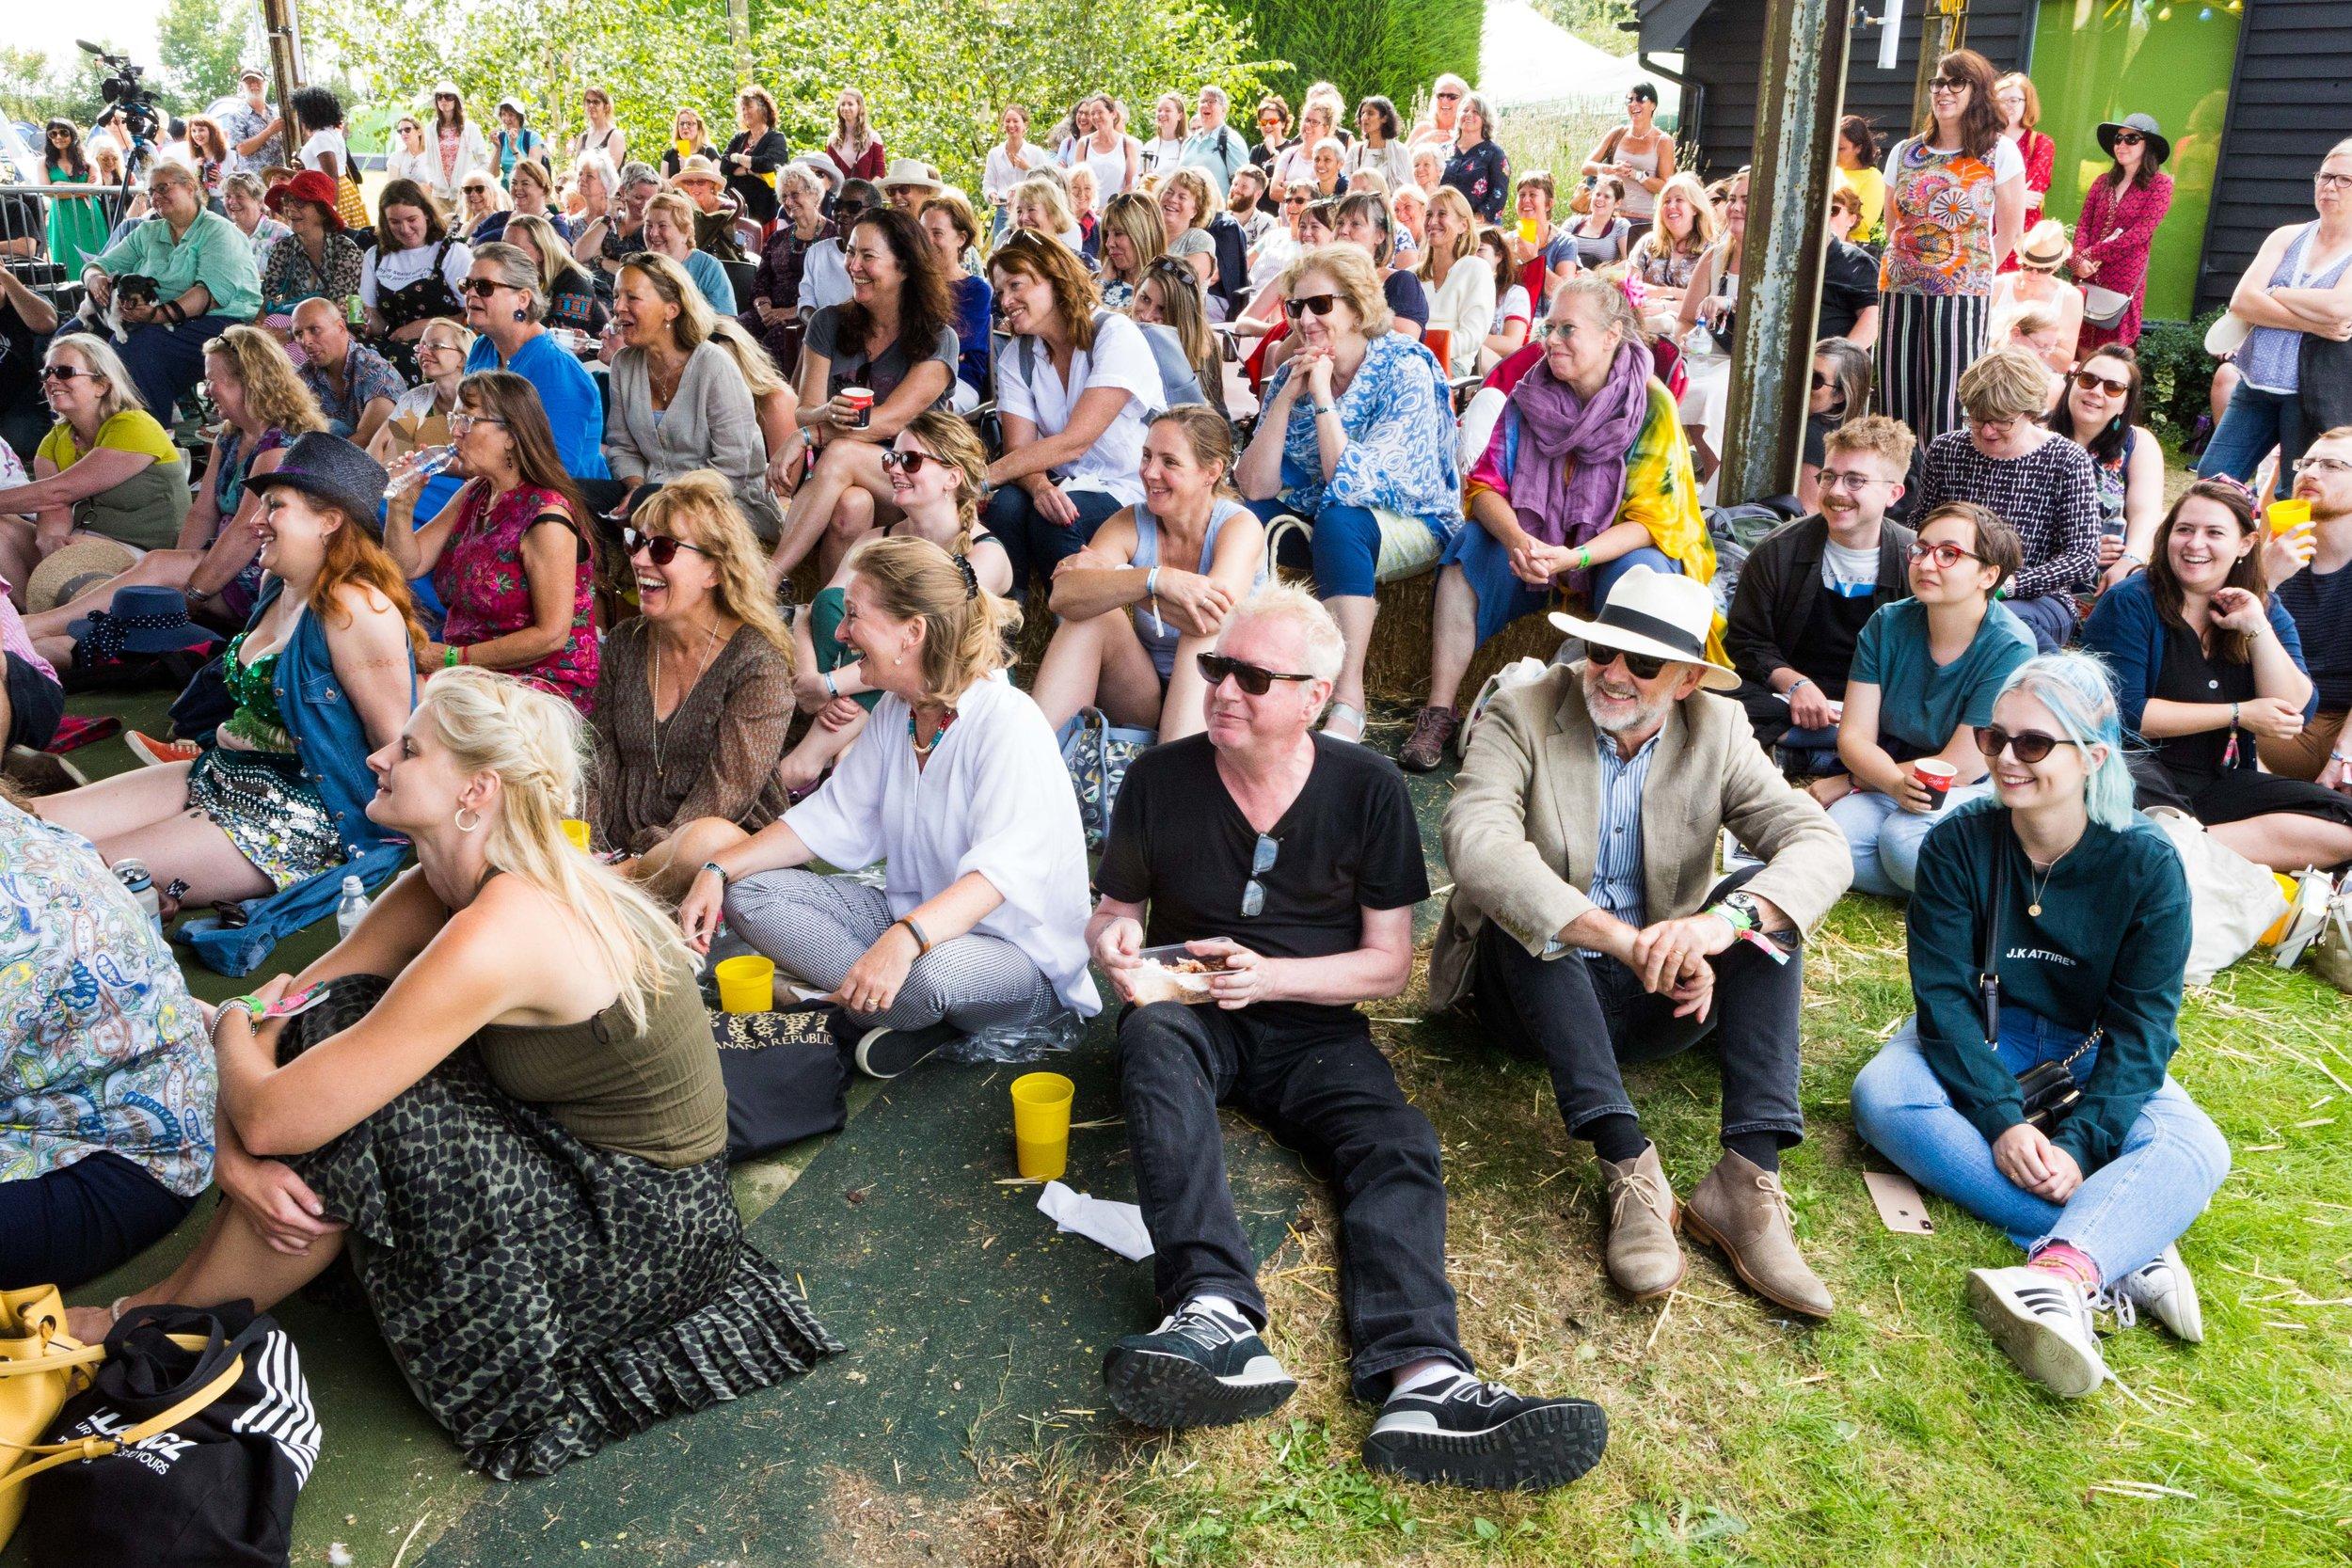 Razvi_Adam_Primadonna_Festival_2019_web-77.jpg